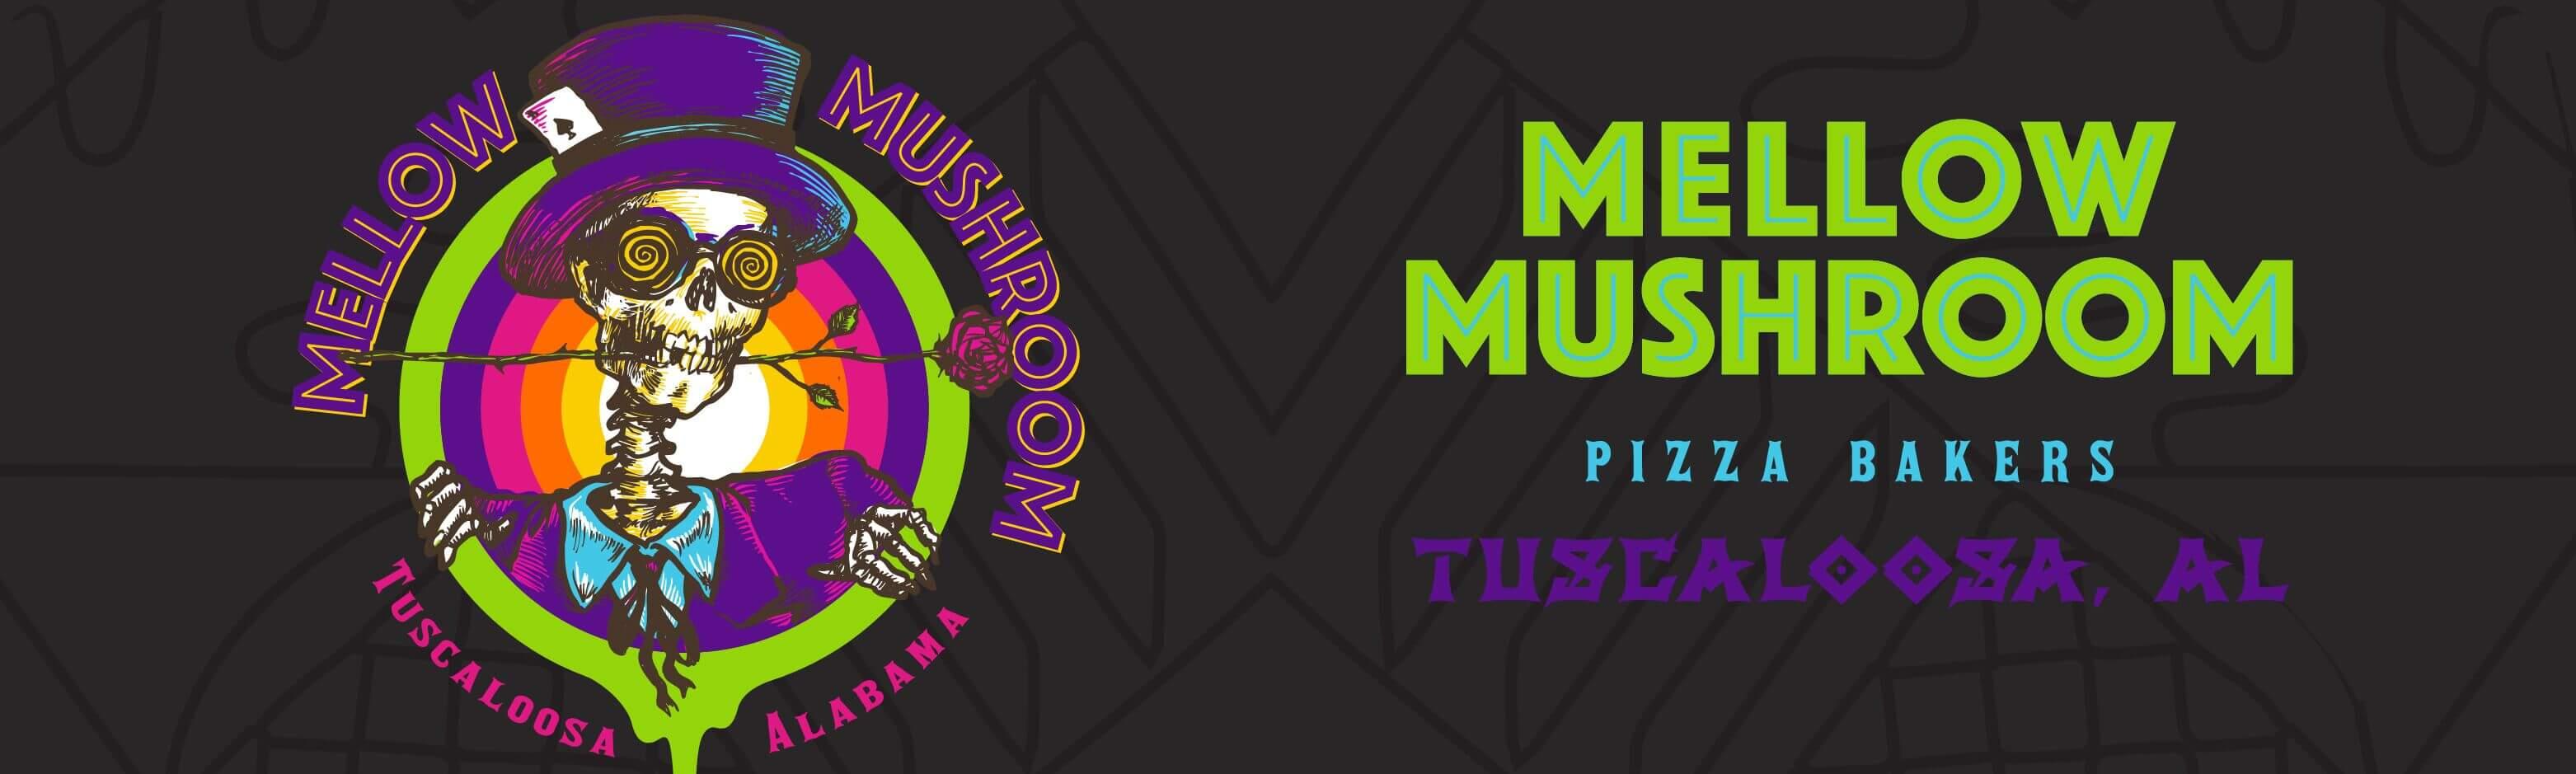 Banner Mellow Mushroom Tuscaloosa local degisn logo